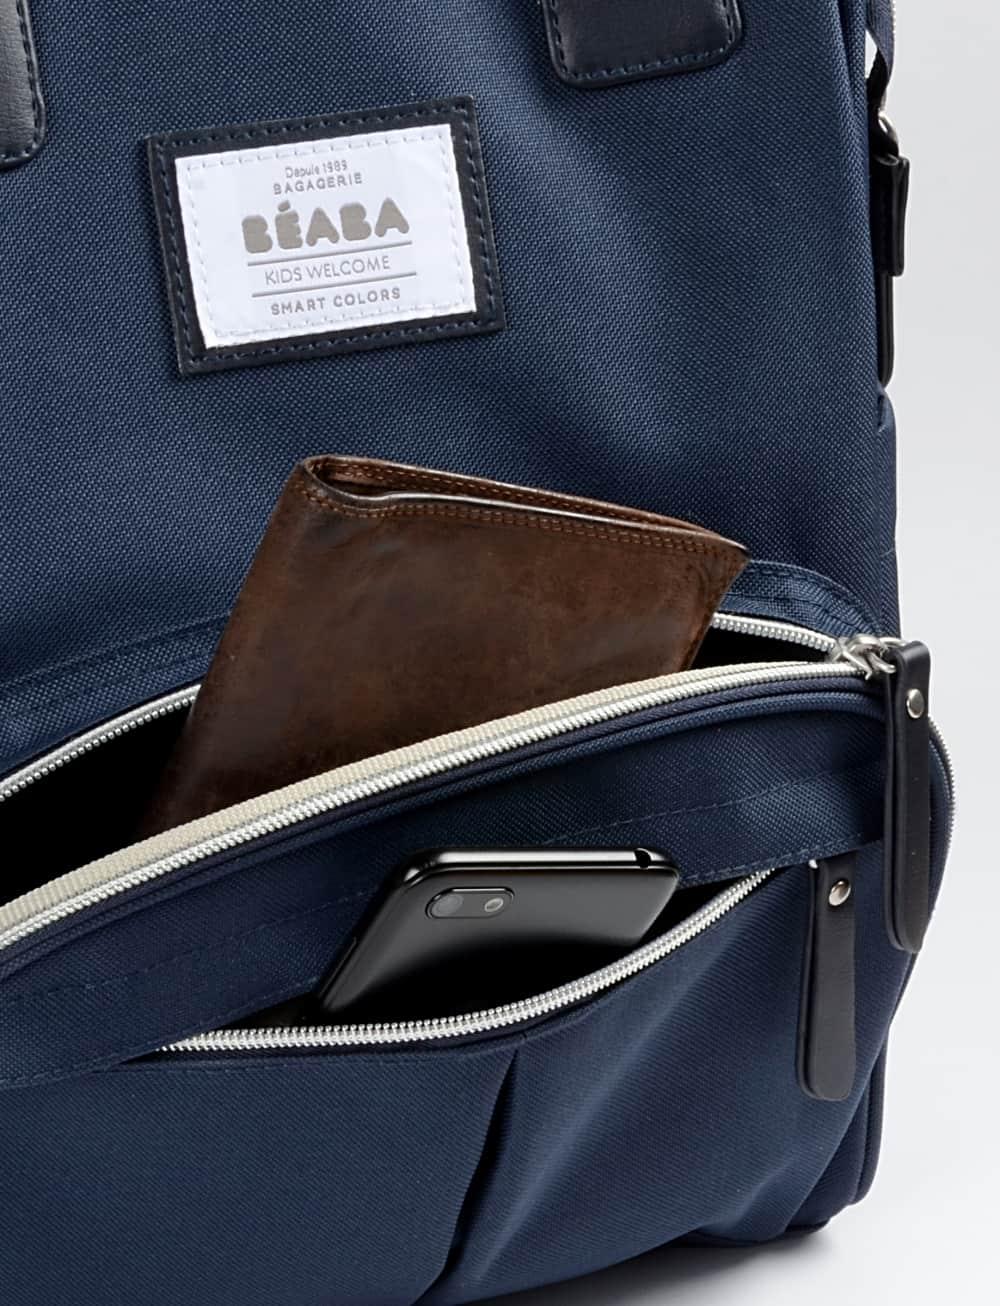 Front Open Pocket of Wellington Backpack Diaper Bag Navy